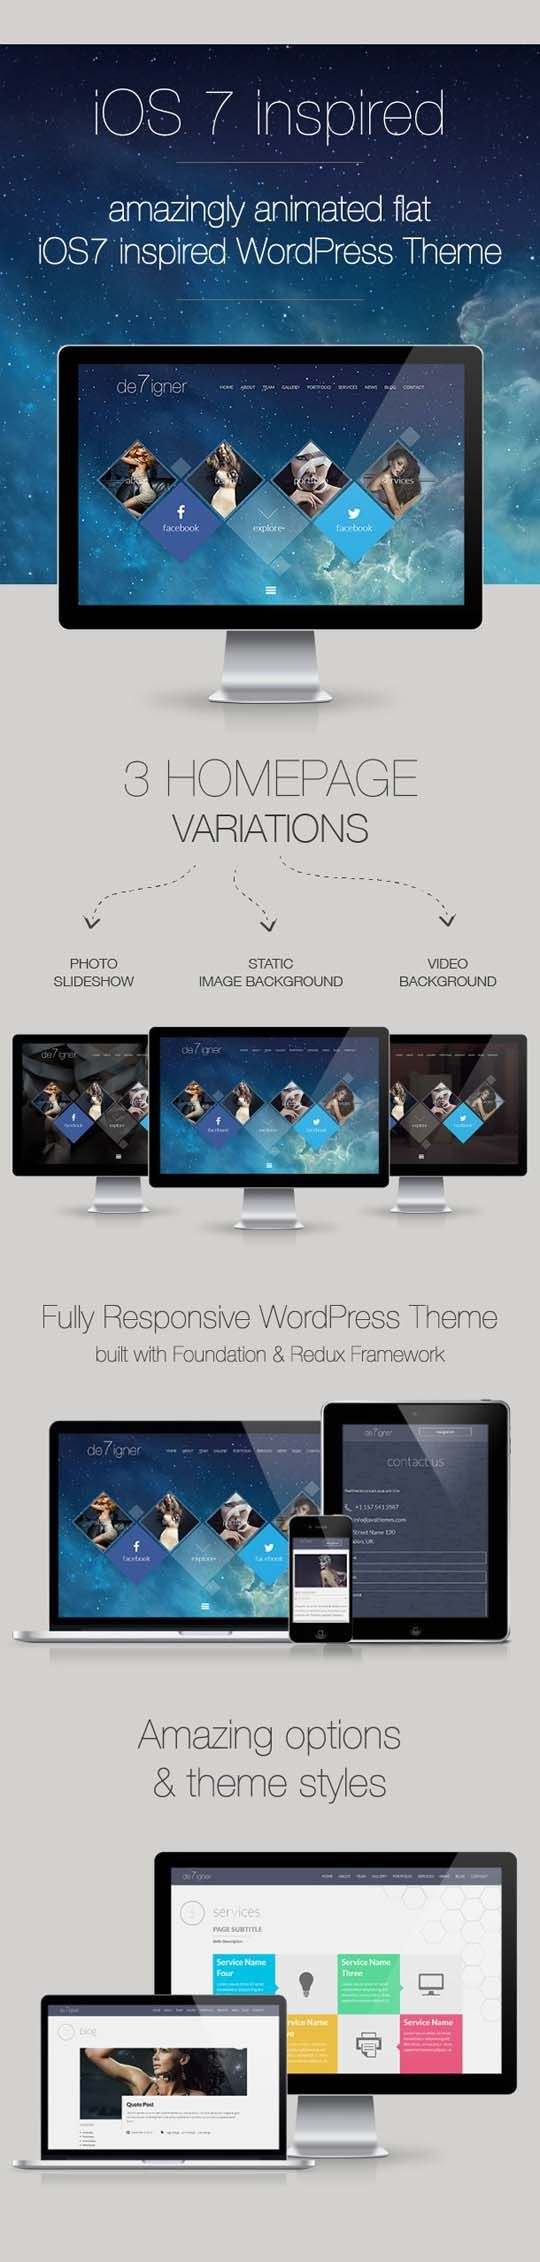 De7igner – Flat iOS7 Inspired OnePage Parallax Theme